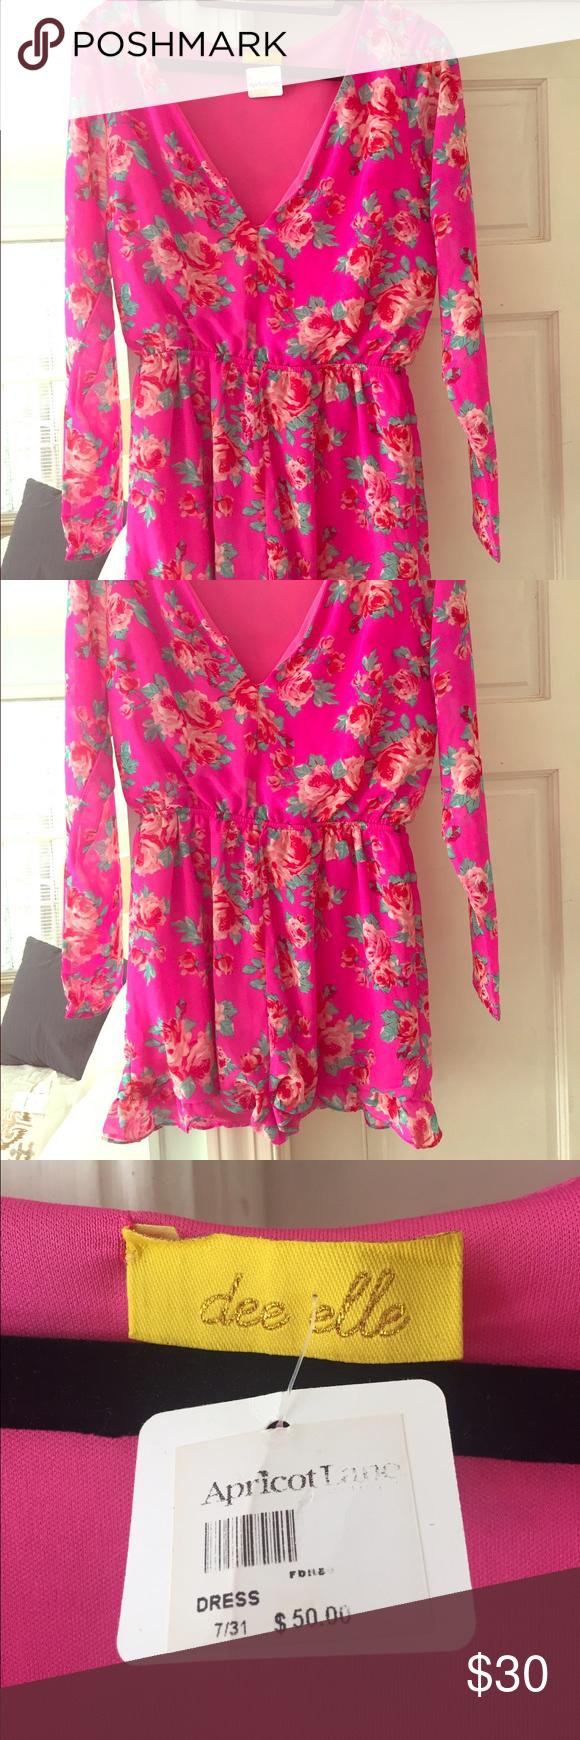 Pink floral print Romper Super flattering romper, perfect for spring/summer, NWT Dresses